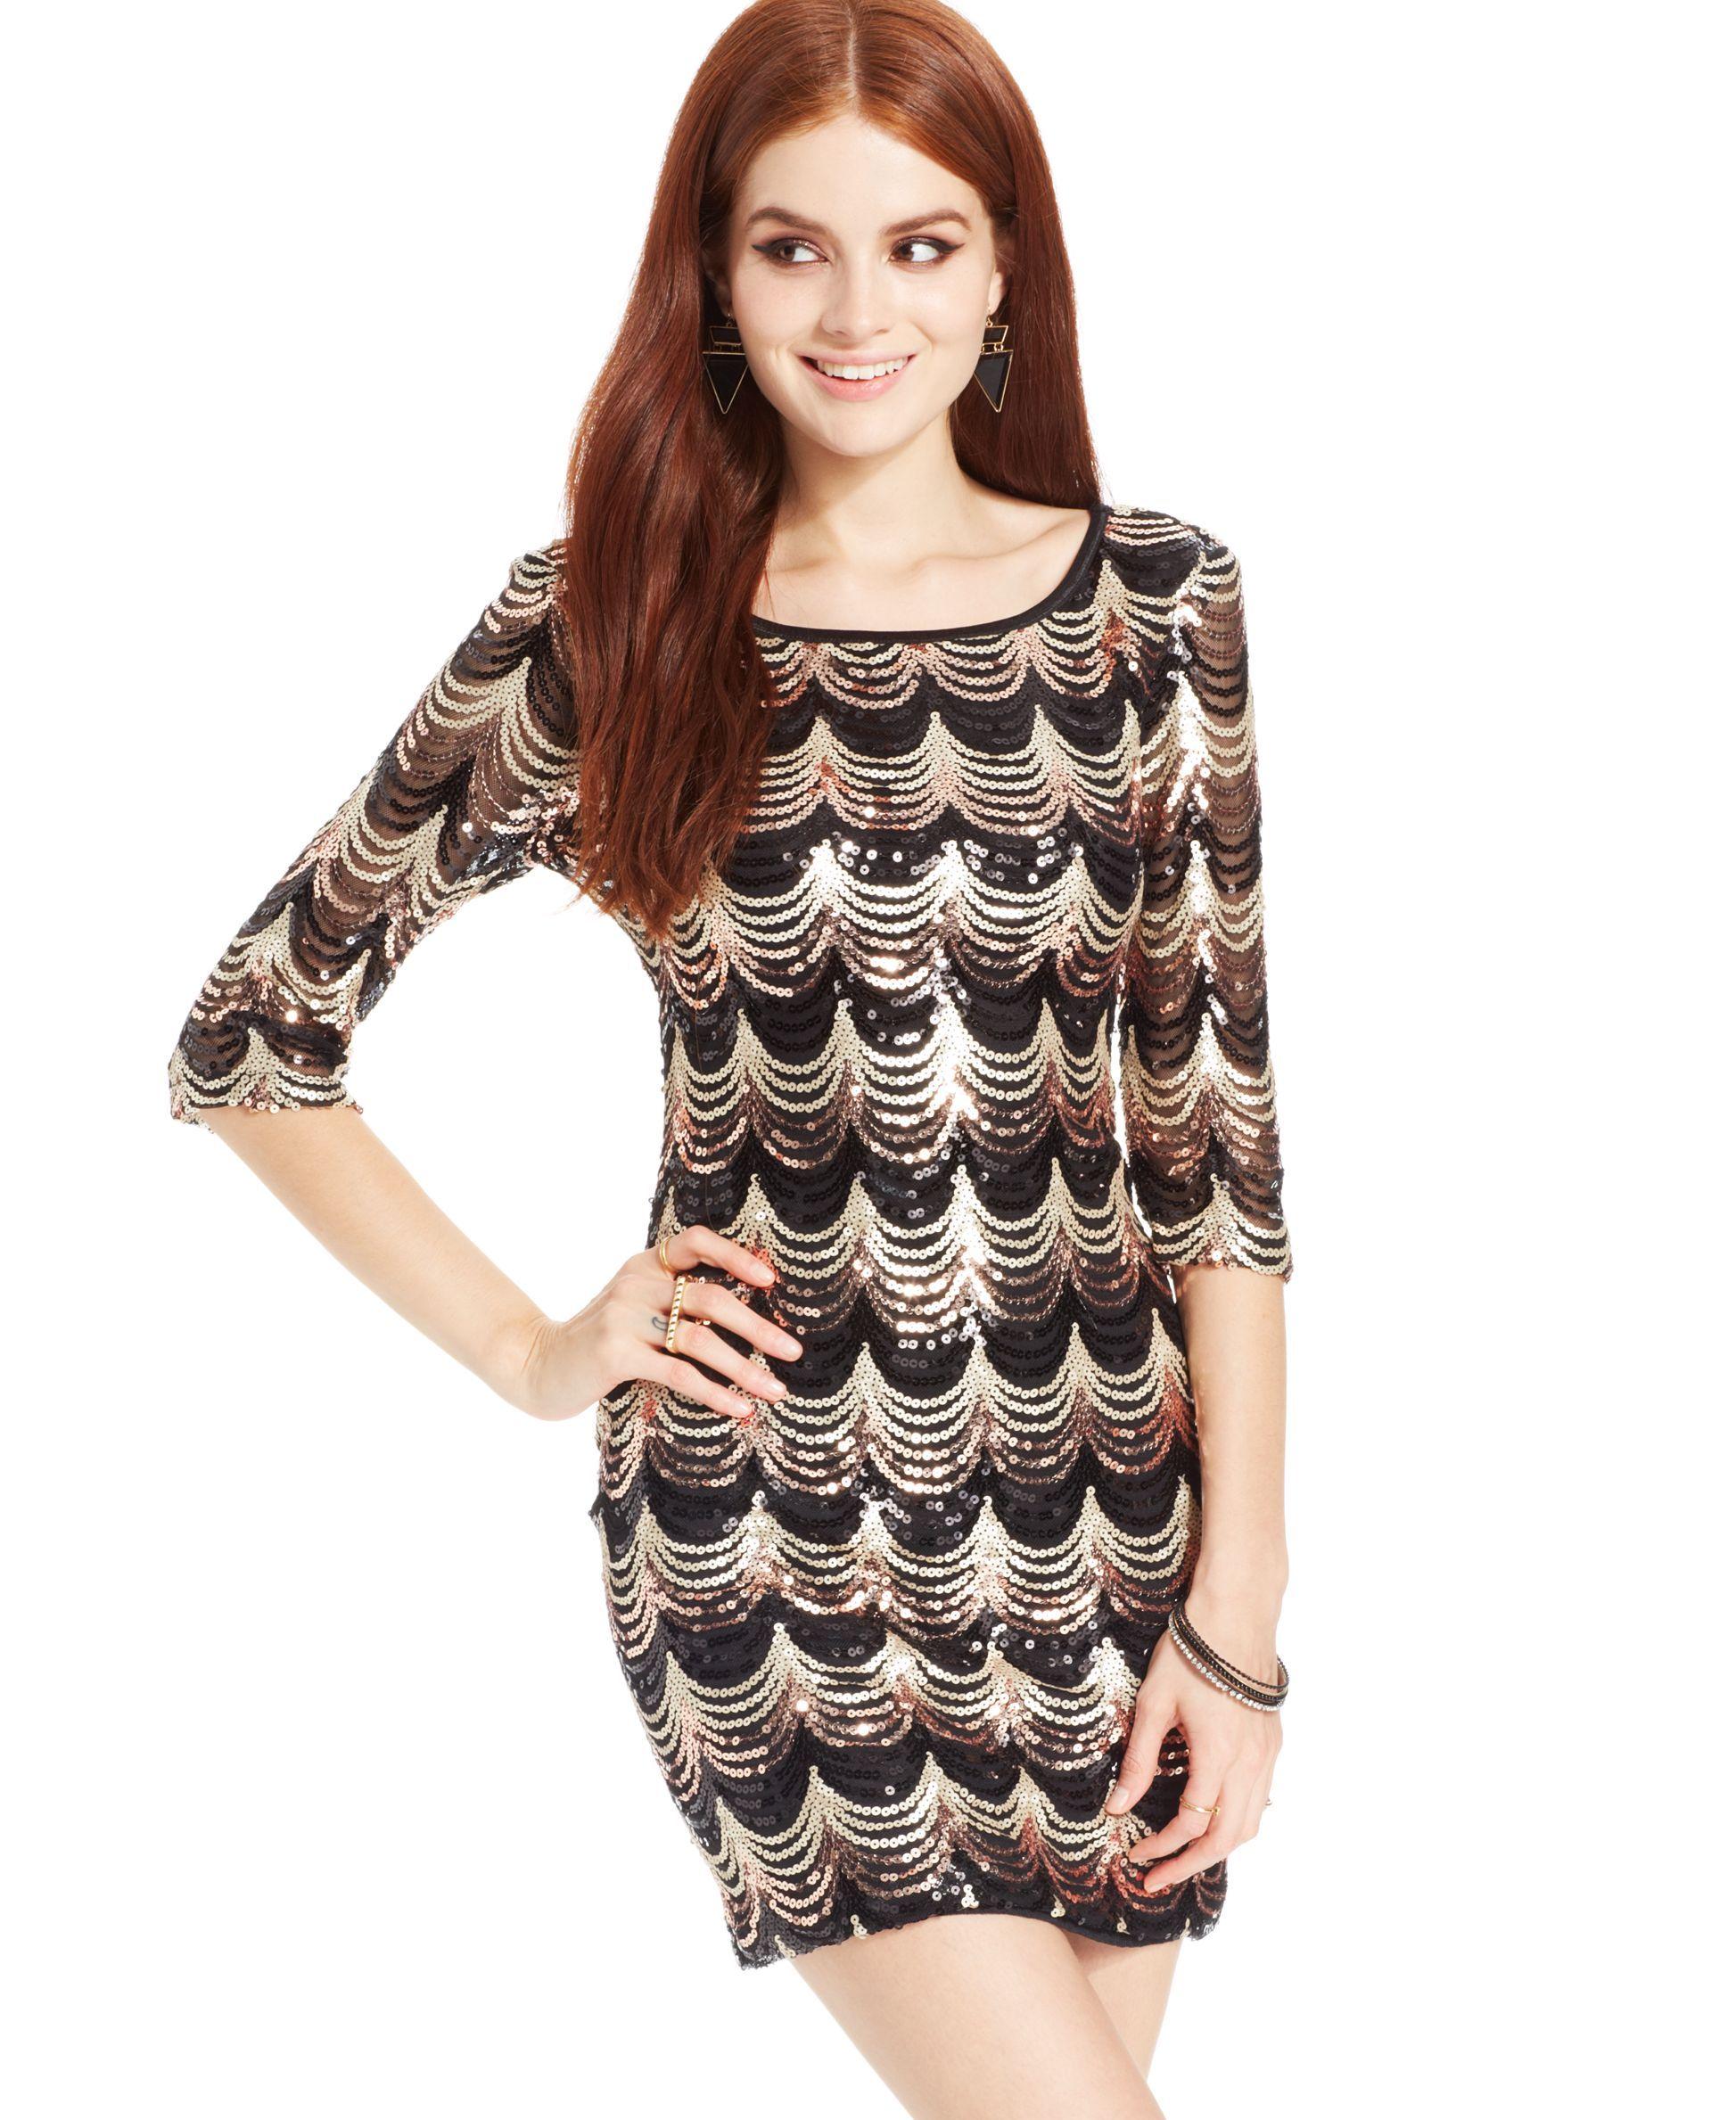 e8027d4cf68a7 Crystal Doll Juniors' Sequin Three-Quarter-Sleeve Dress | Products ...